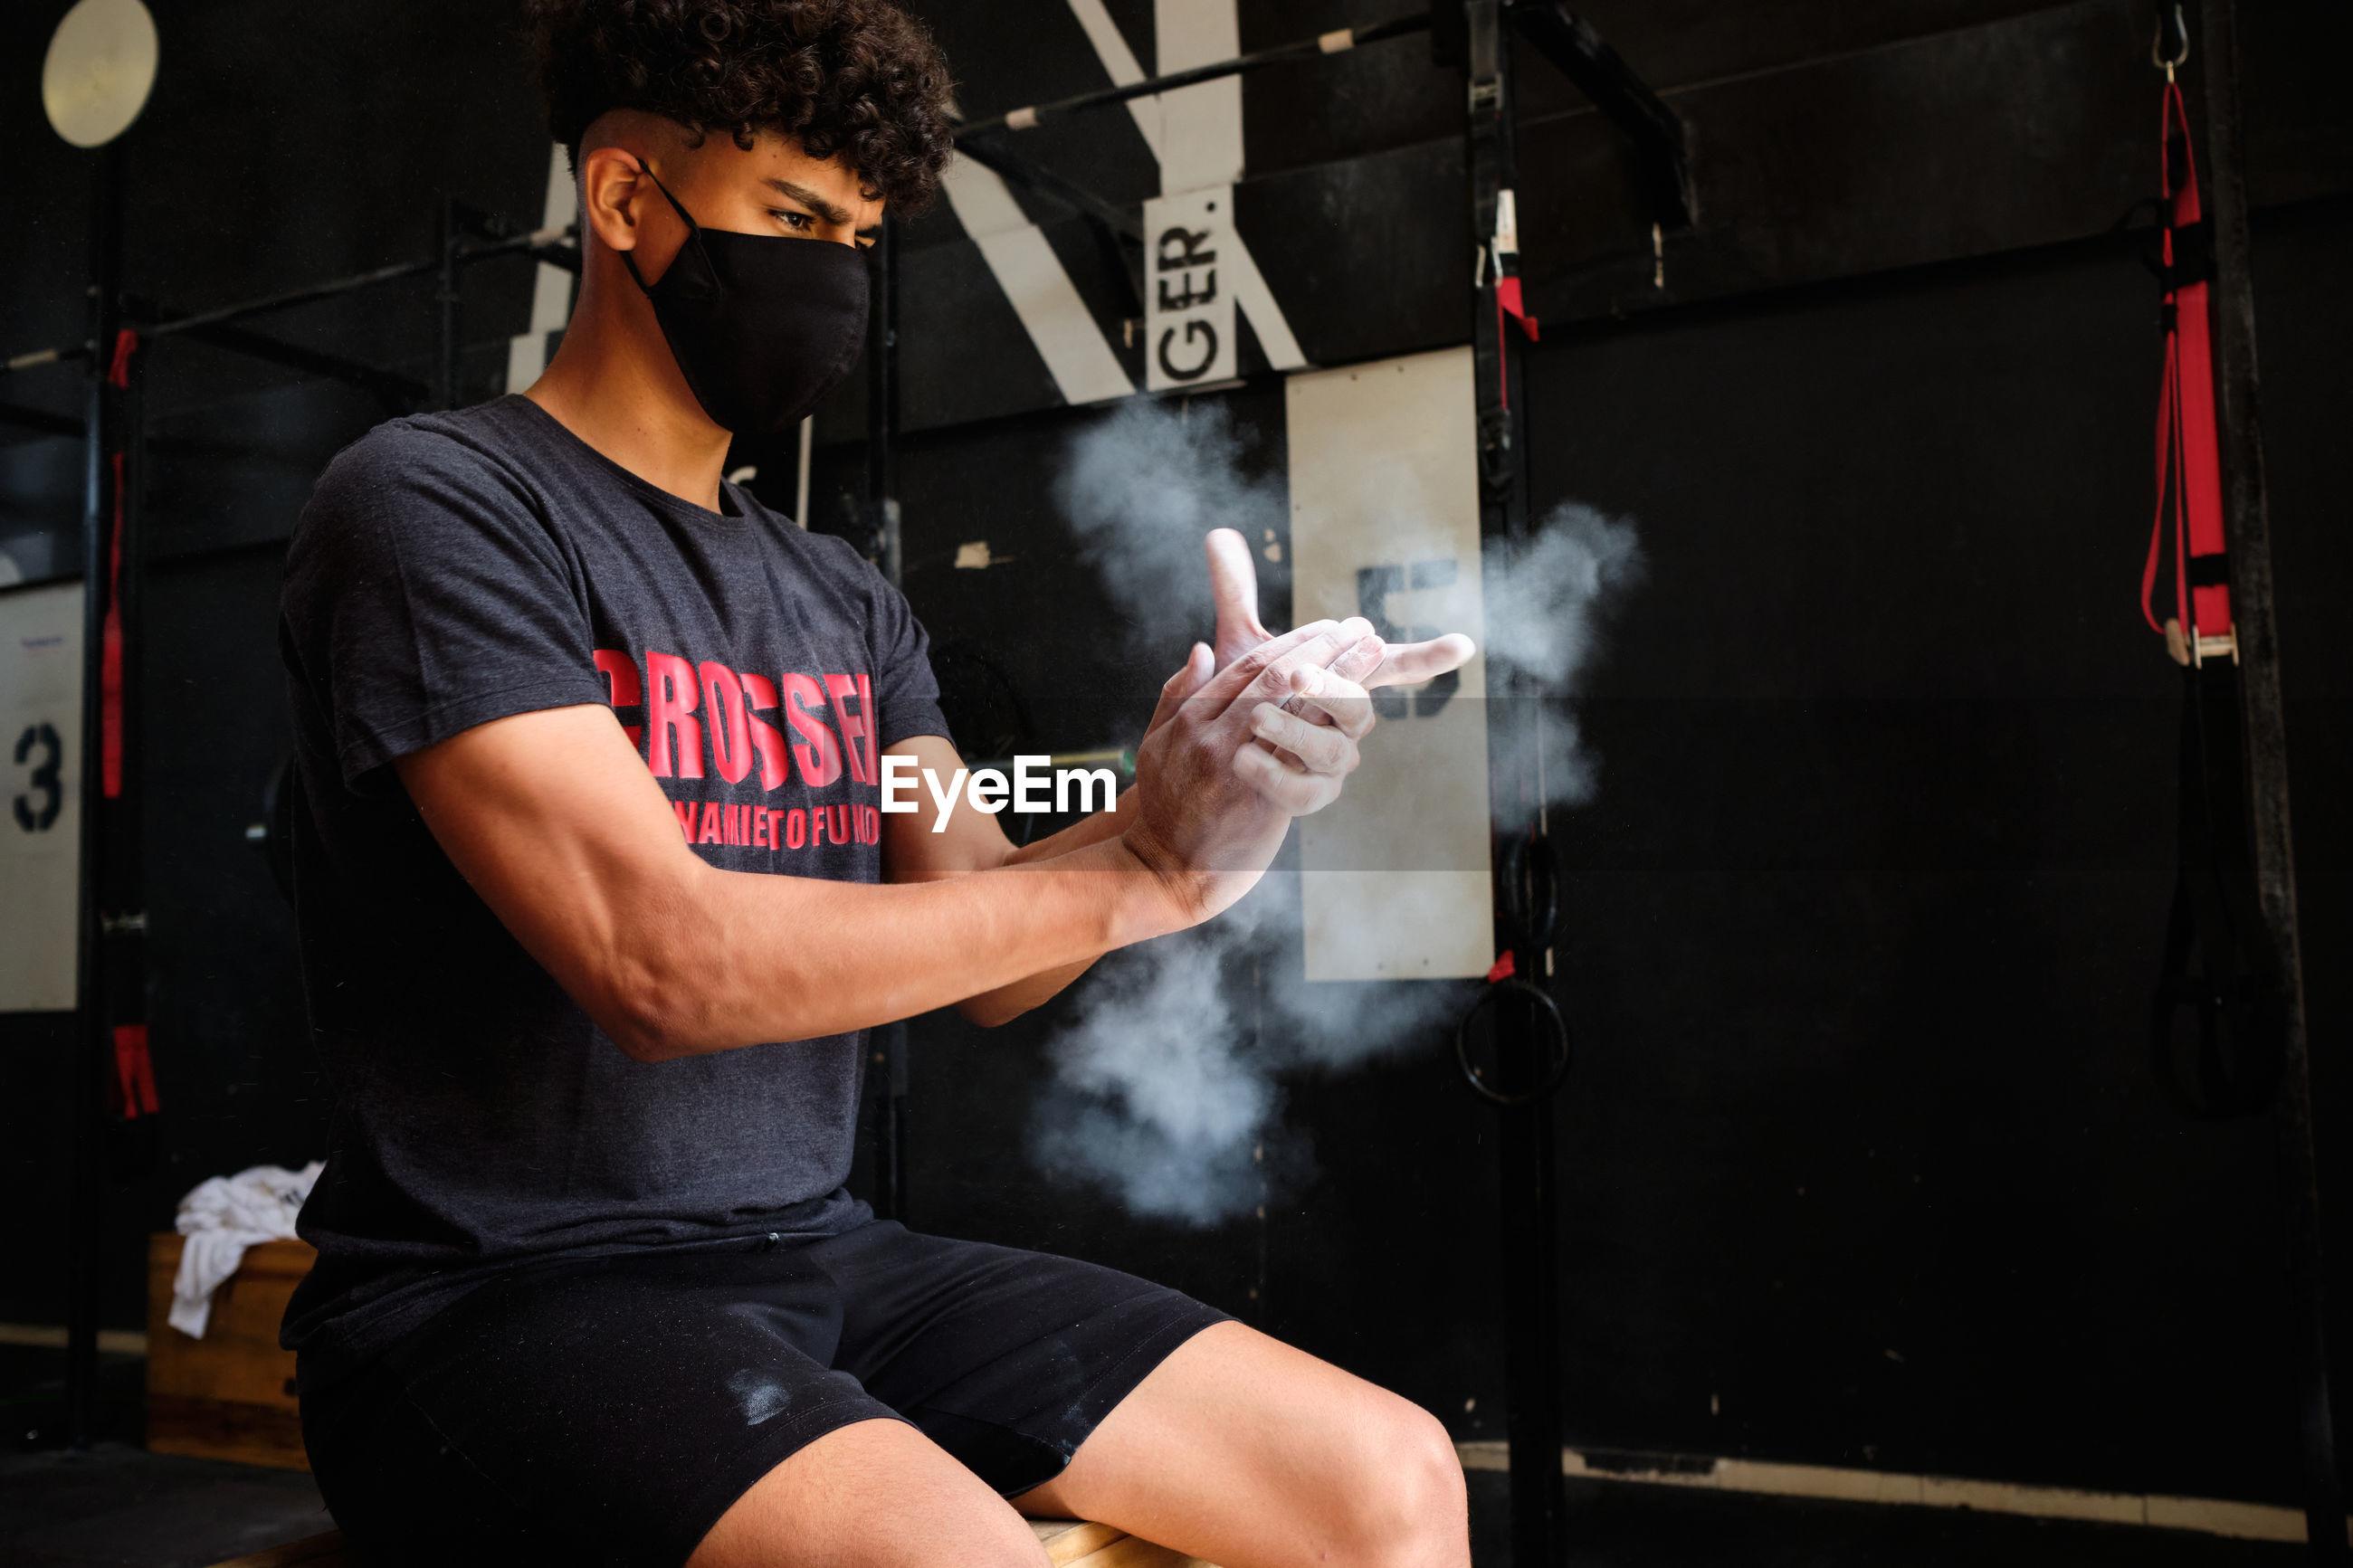 Young man wearing mask sitting at gym